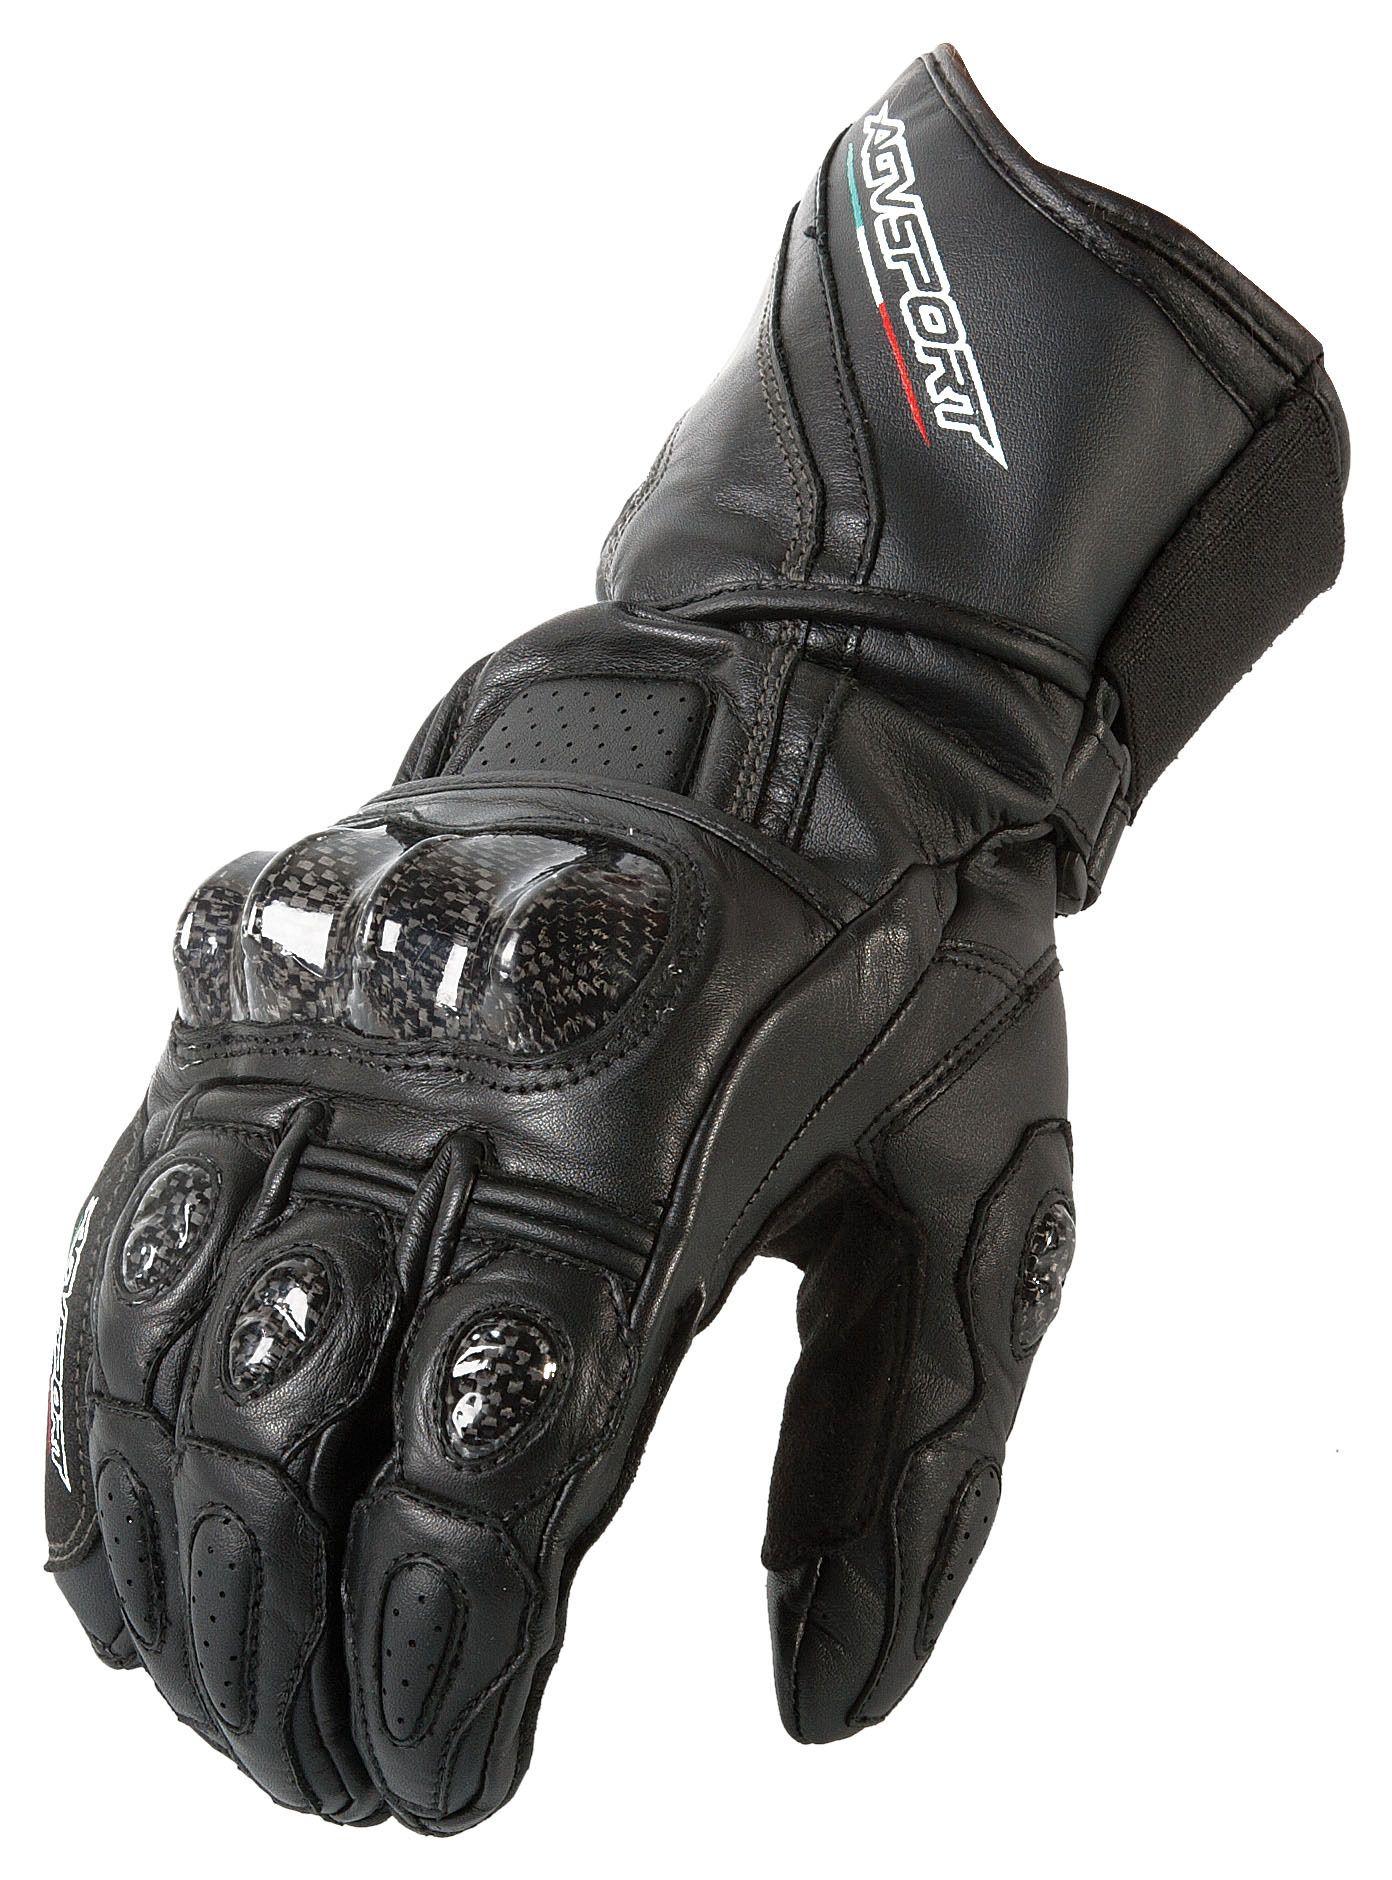 Motorcycle gloves thin - Motorcycle Gloves Thin